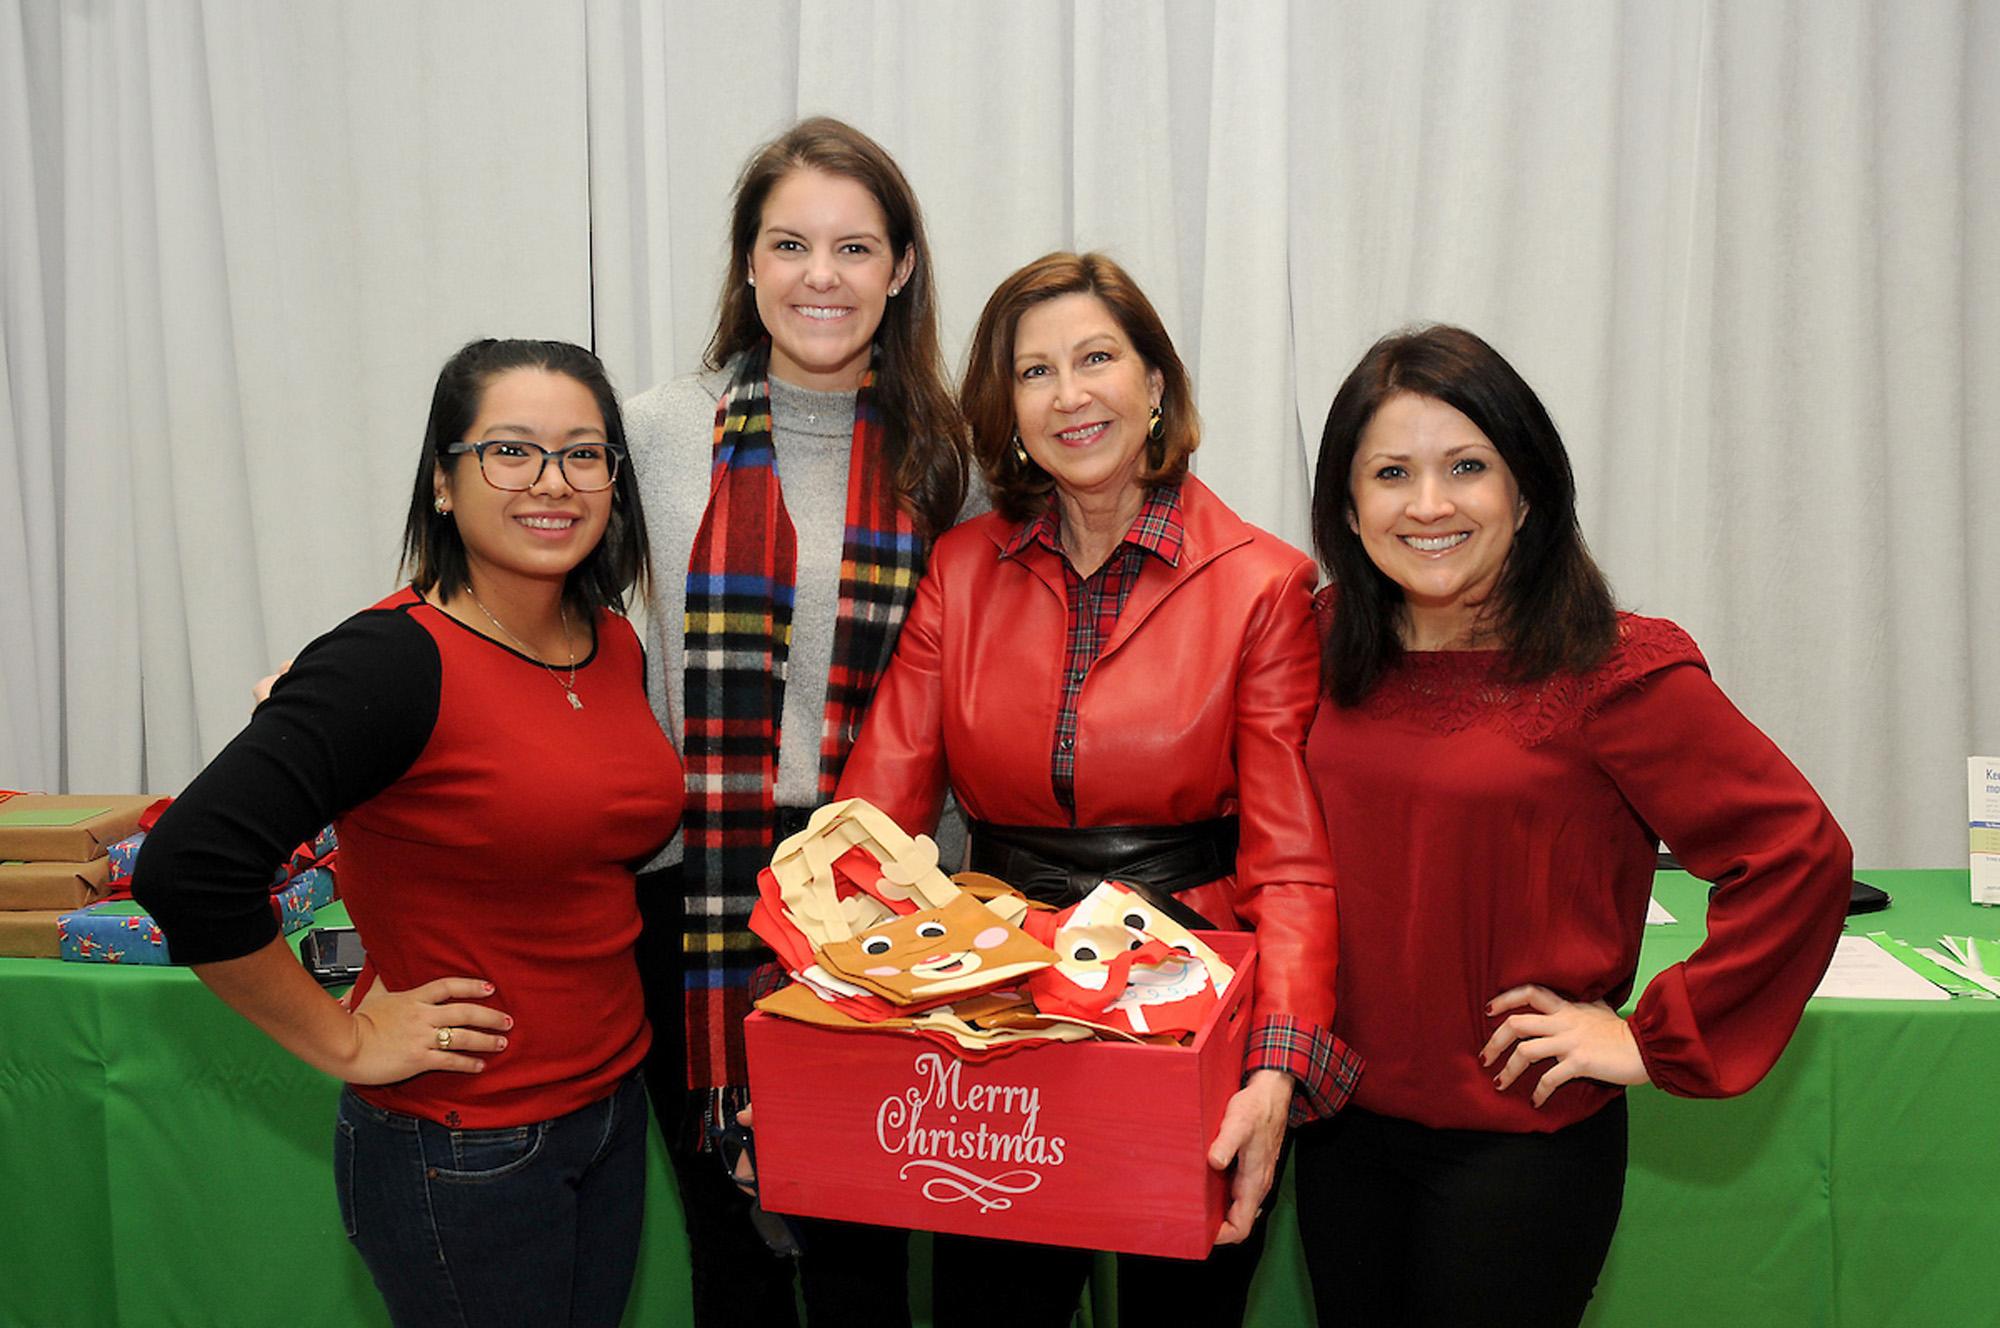 Atalia Valdez, Jennifer Meyer, Janet McCloskey and Krista Fredrick